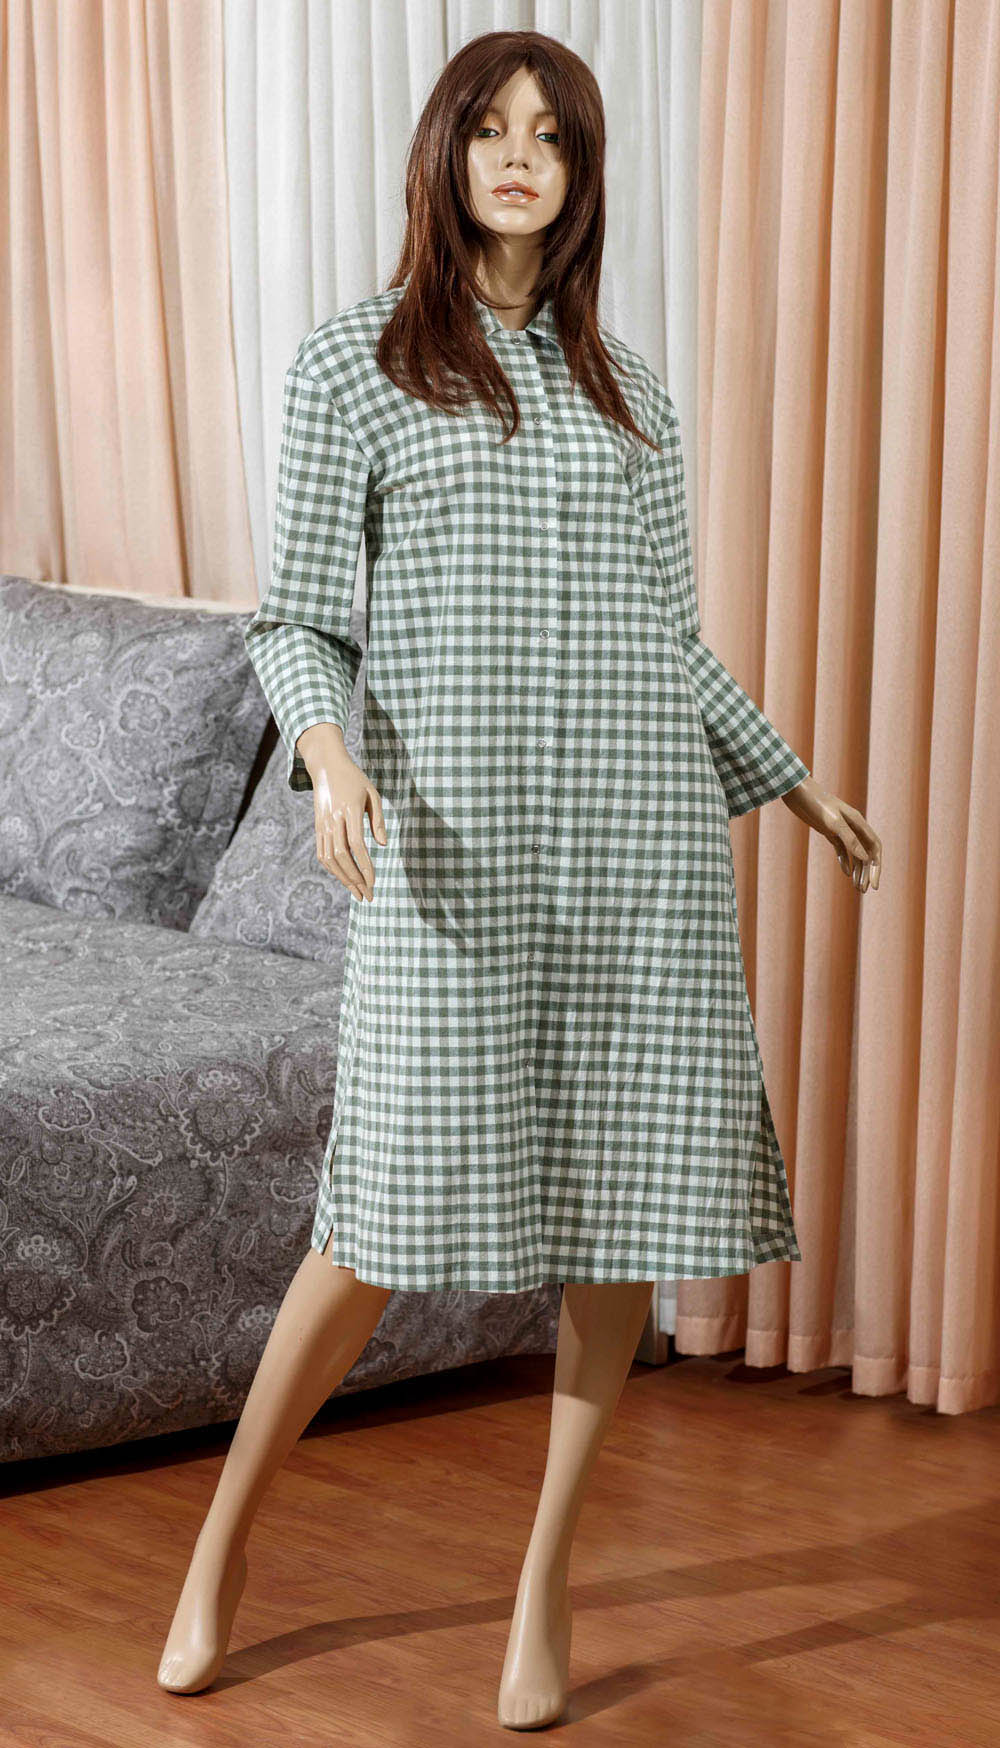 Домашние халаты Primavelle Домашний халат Vera Цвет: Зеленый (S-M) домашние халаты mia mia домашний халат yesenia xl